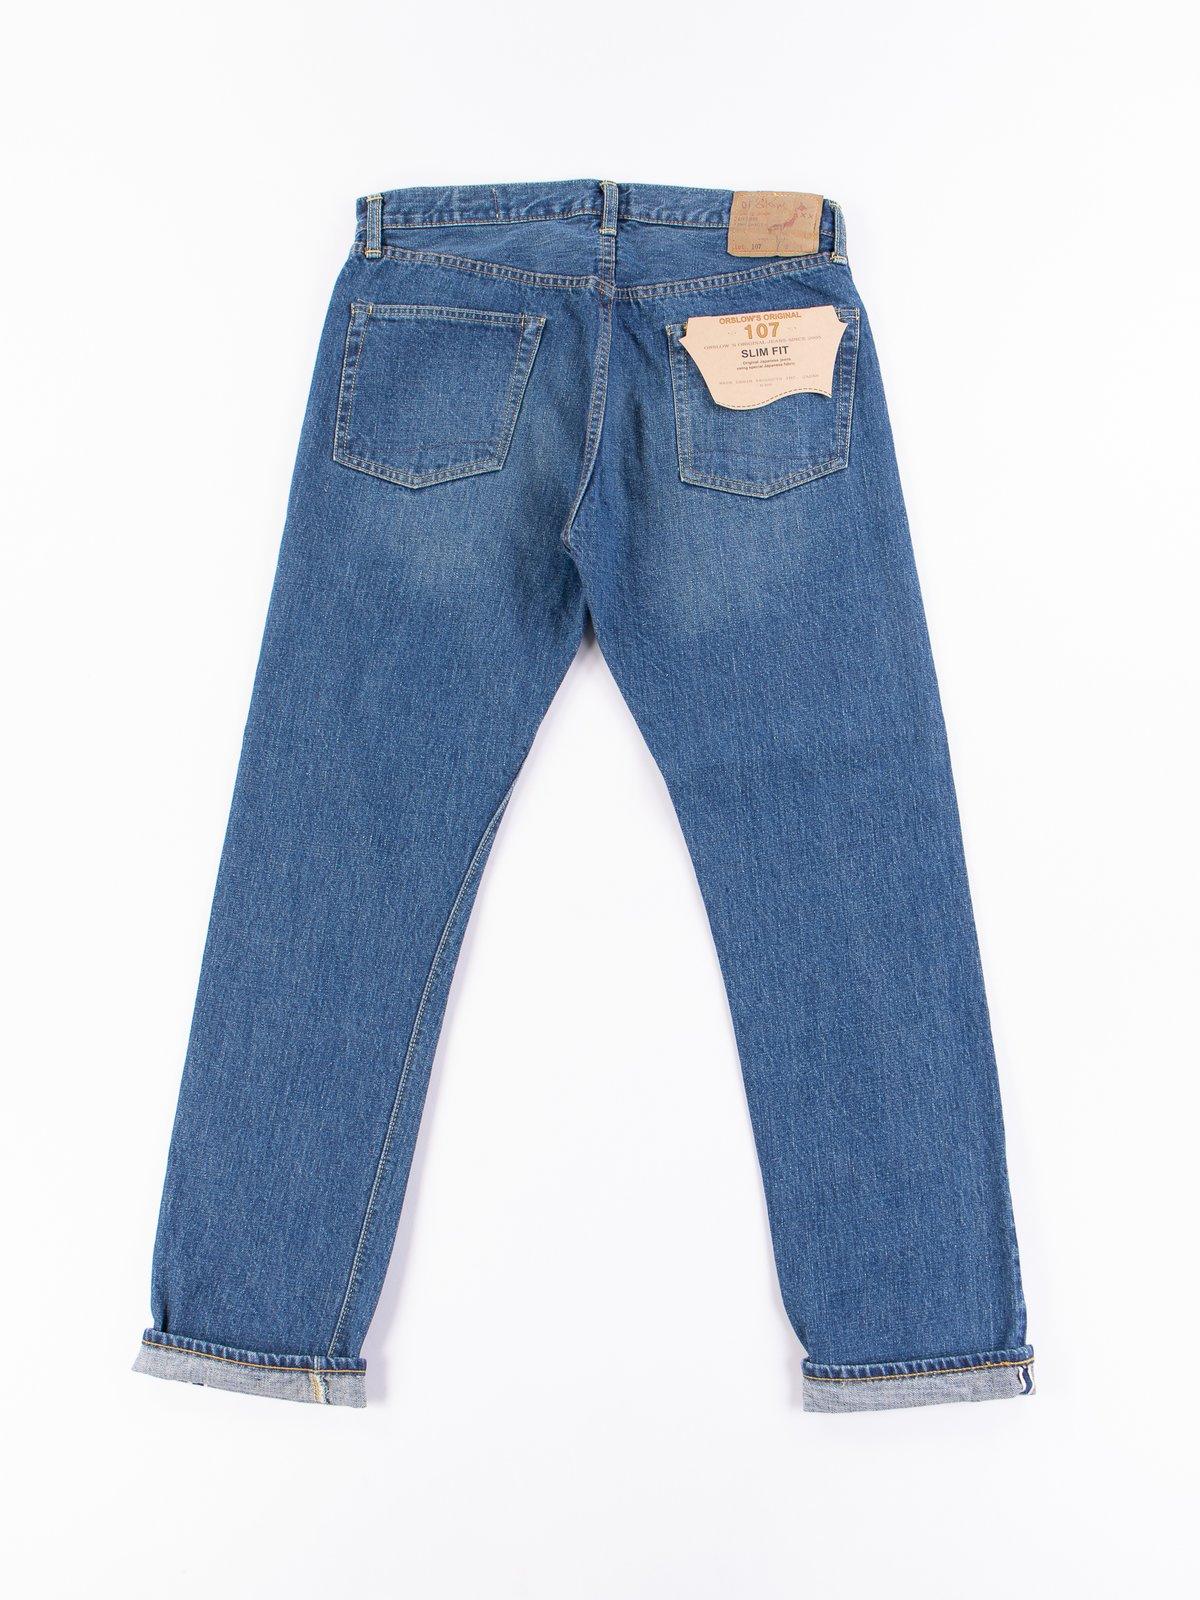 2 Year Wash 107 Slim Fit Jean - Image 8